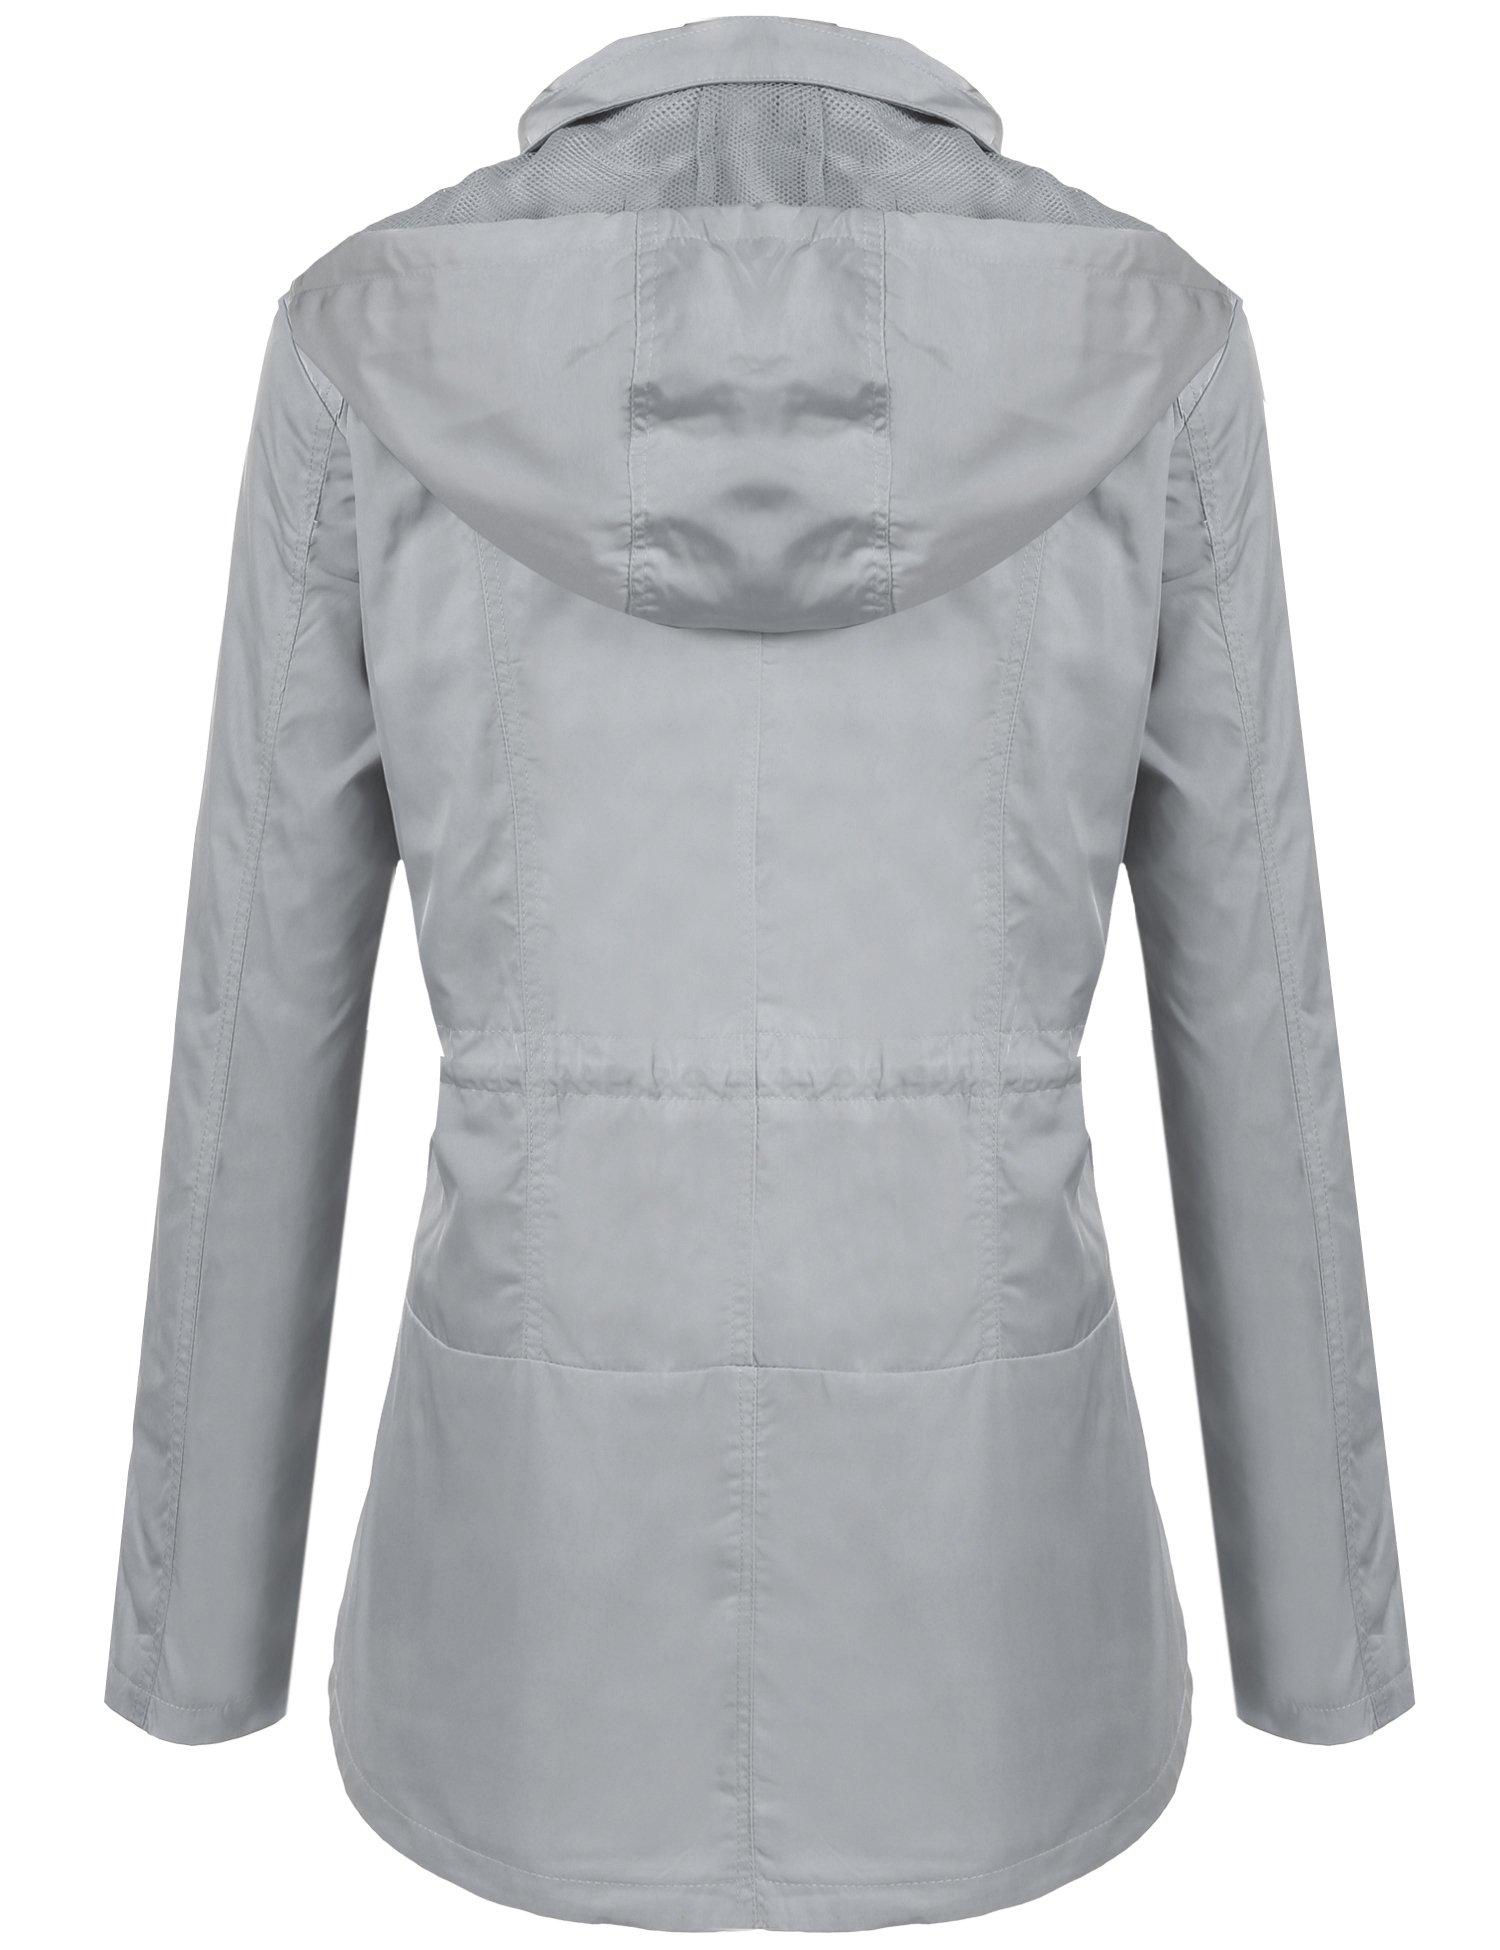 ANGVNS Women's Waterproof Lightweight Rain Jacket Anorak with Detachable Hood by ANGVNS (Image #3)